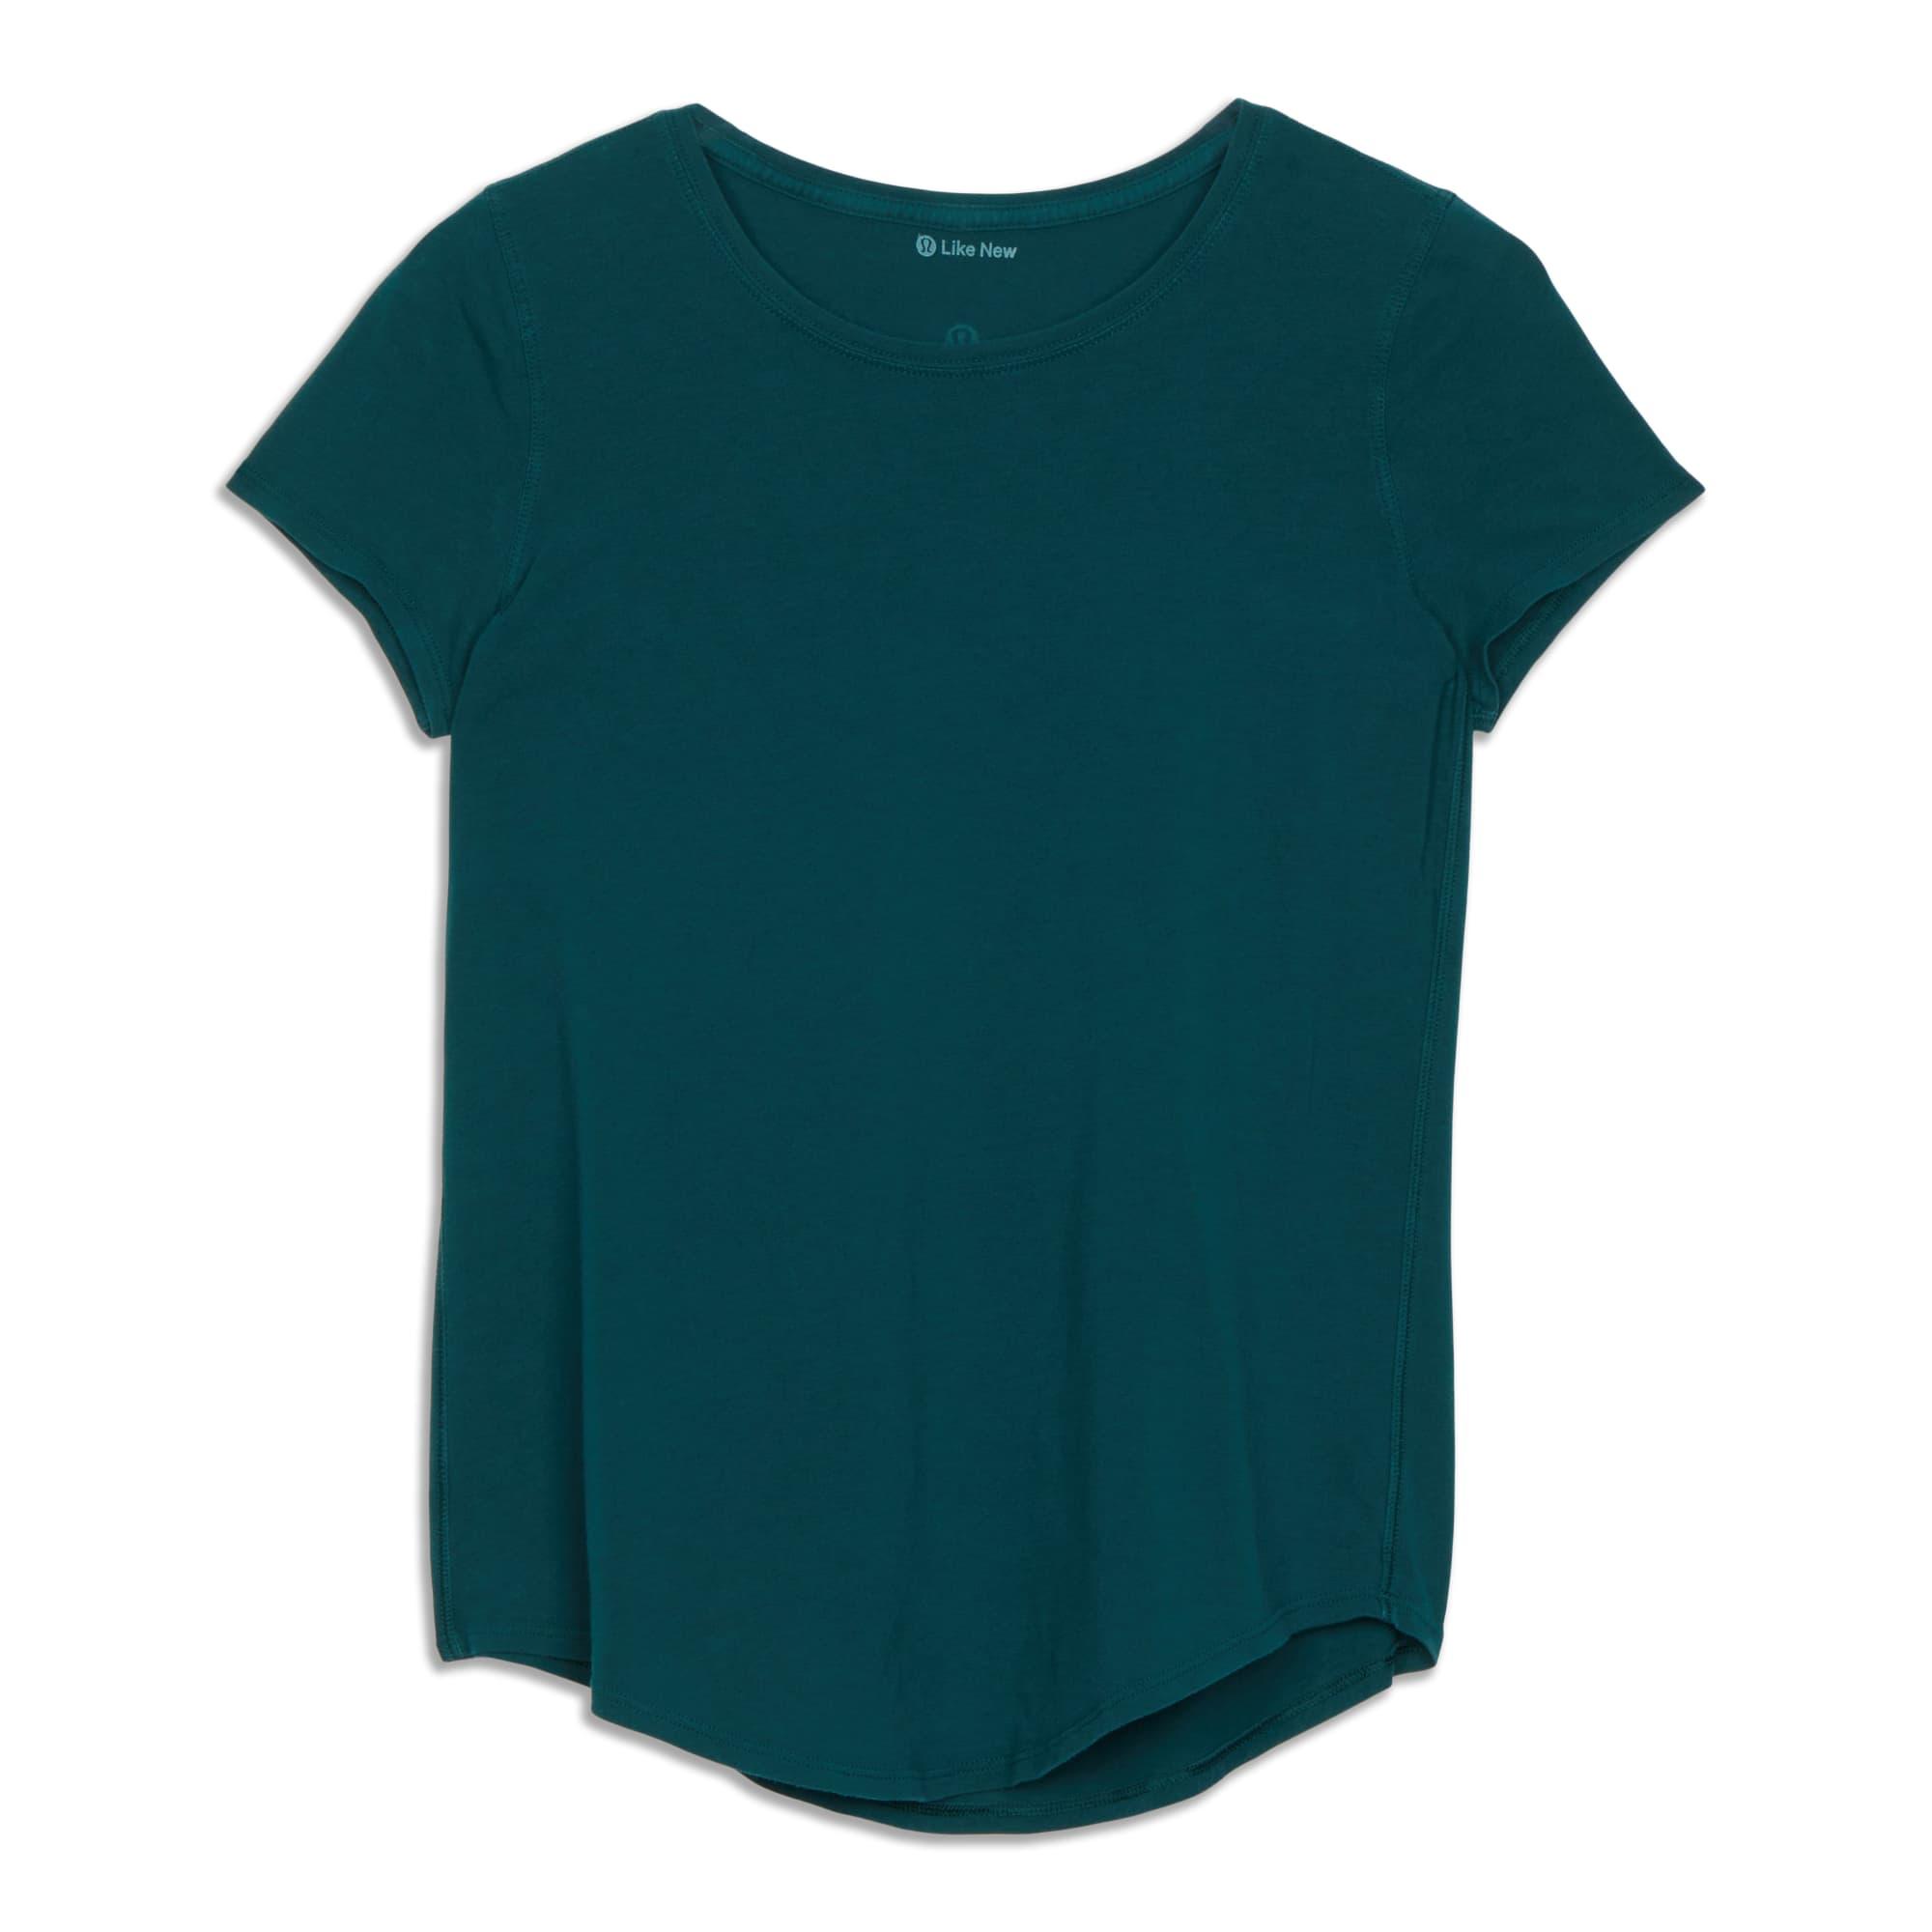 Main product image: Women's Short Sleeve Shirt - Resale